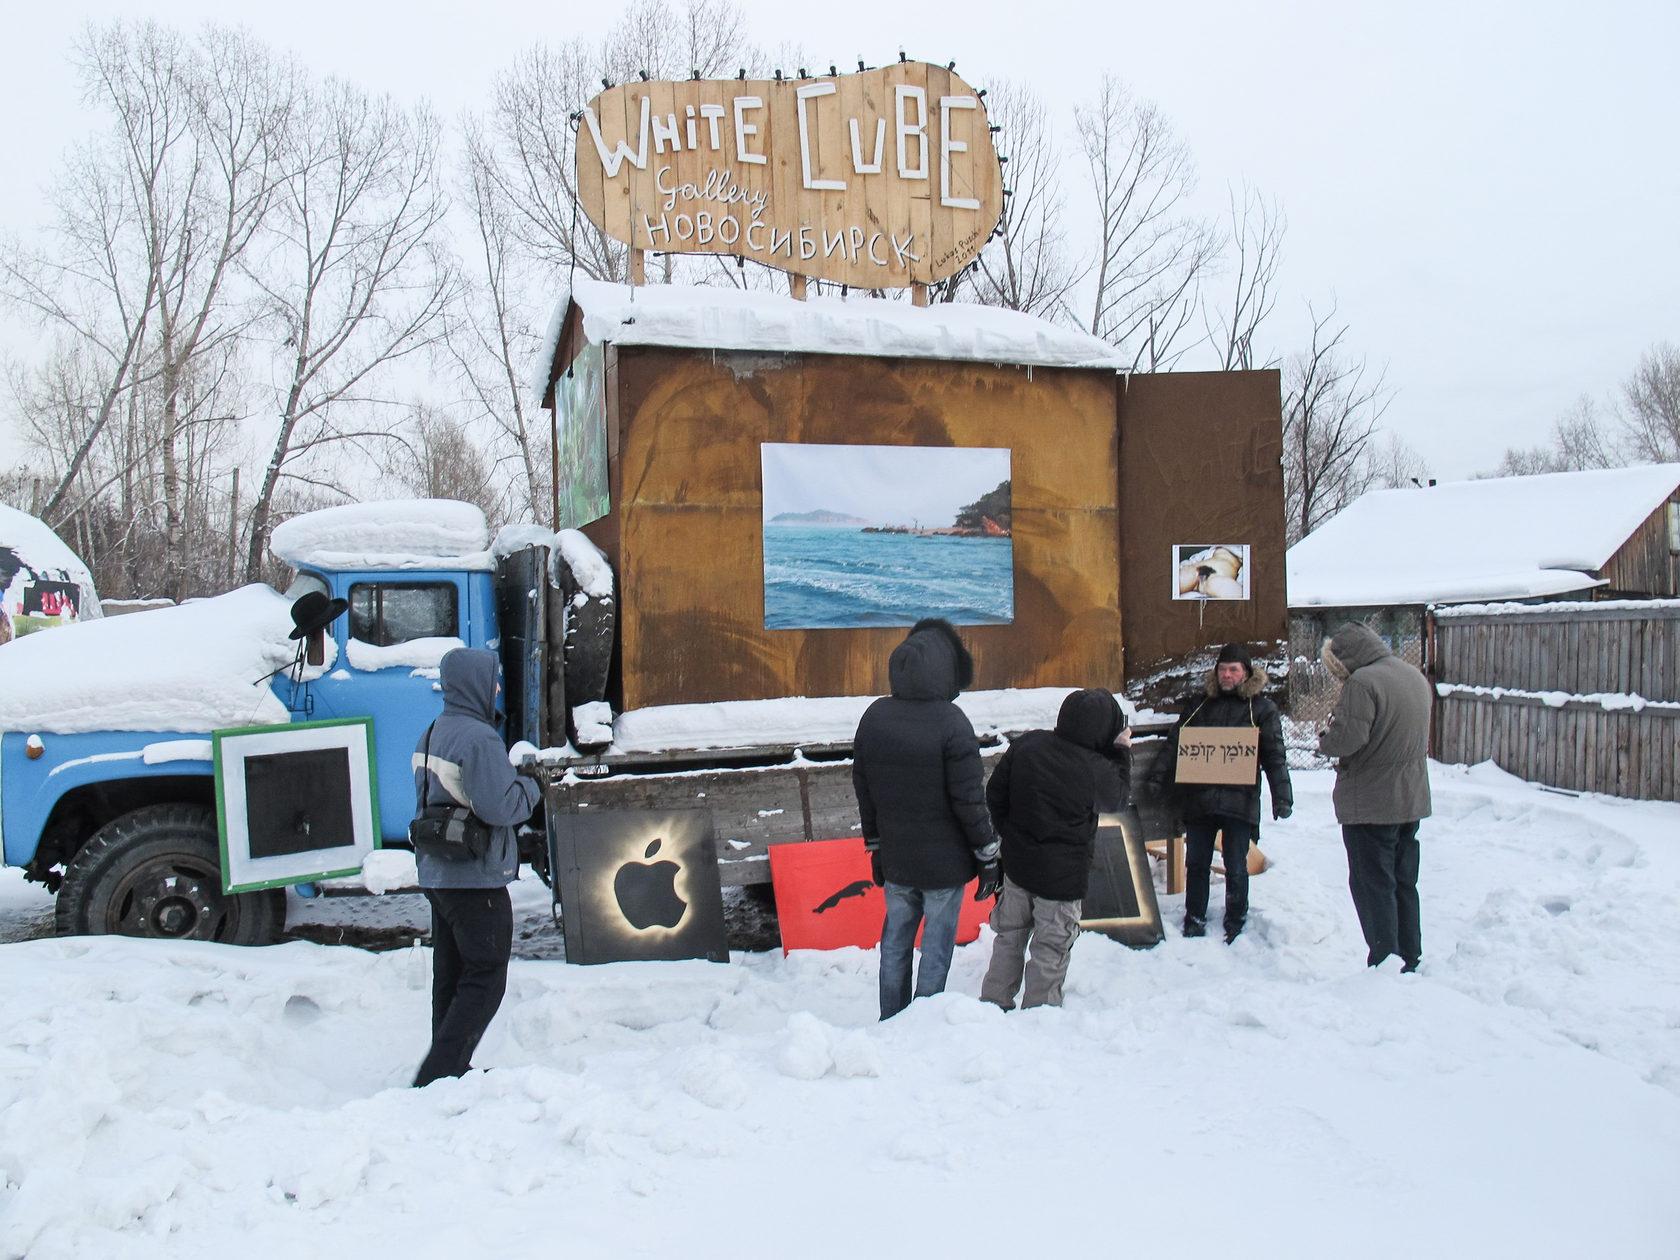 Выставка «Холодно-1» прошла 30 января 2012 года на огороде у Вани Мазуренко (Дыркина). На фото: White Cube Gallery, перед